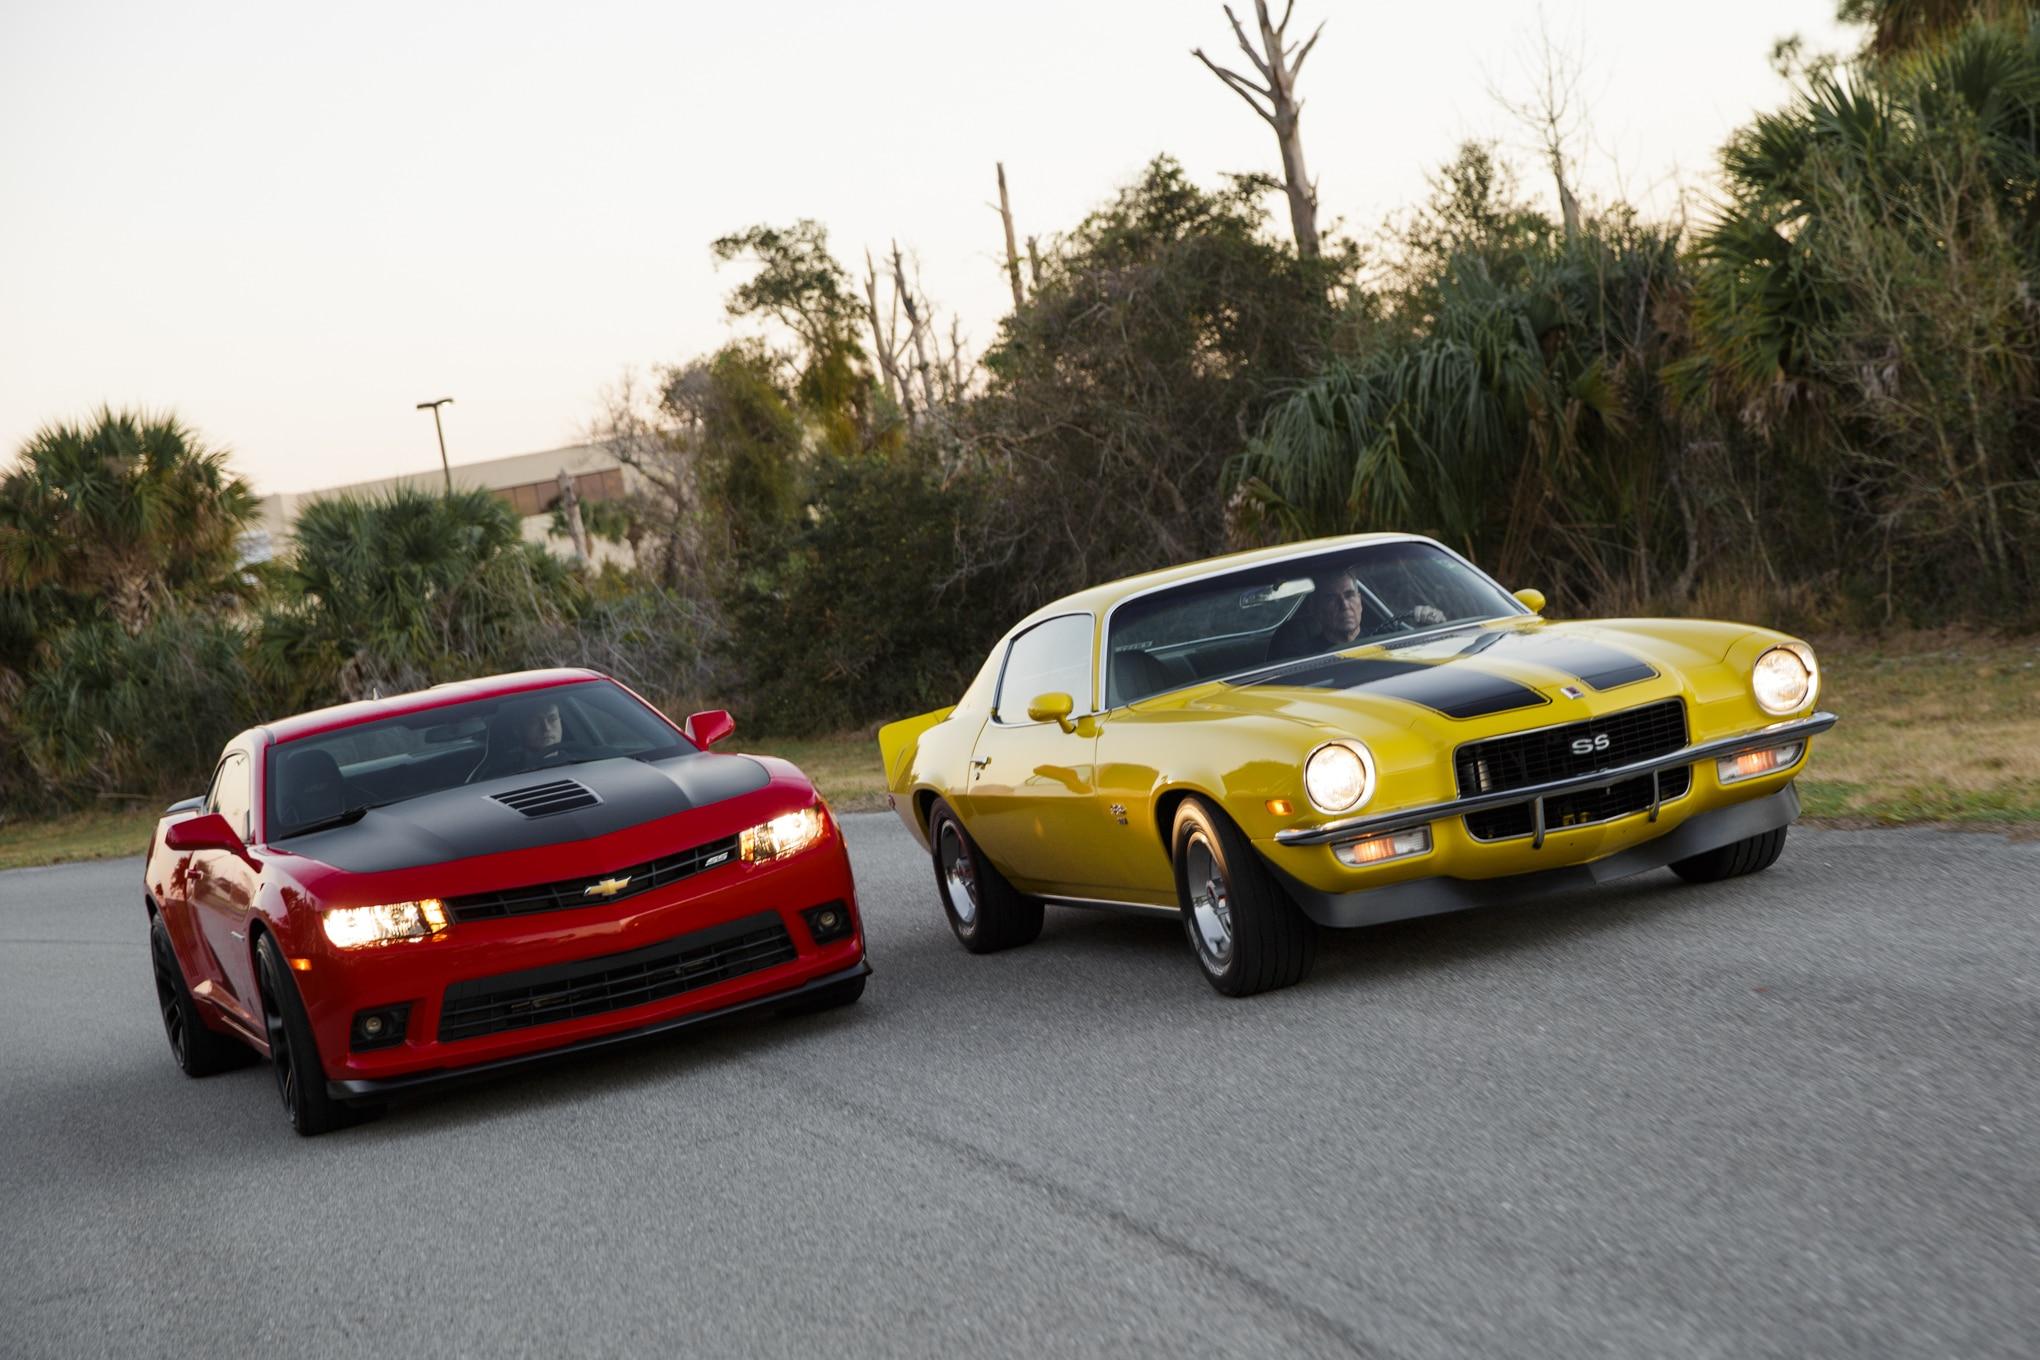 Then vs  Now: 1971 Chevrolet Camaro SS vs  2014 Chevrolet